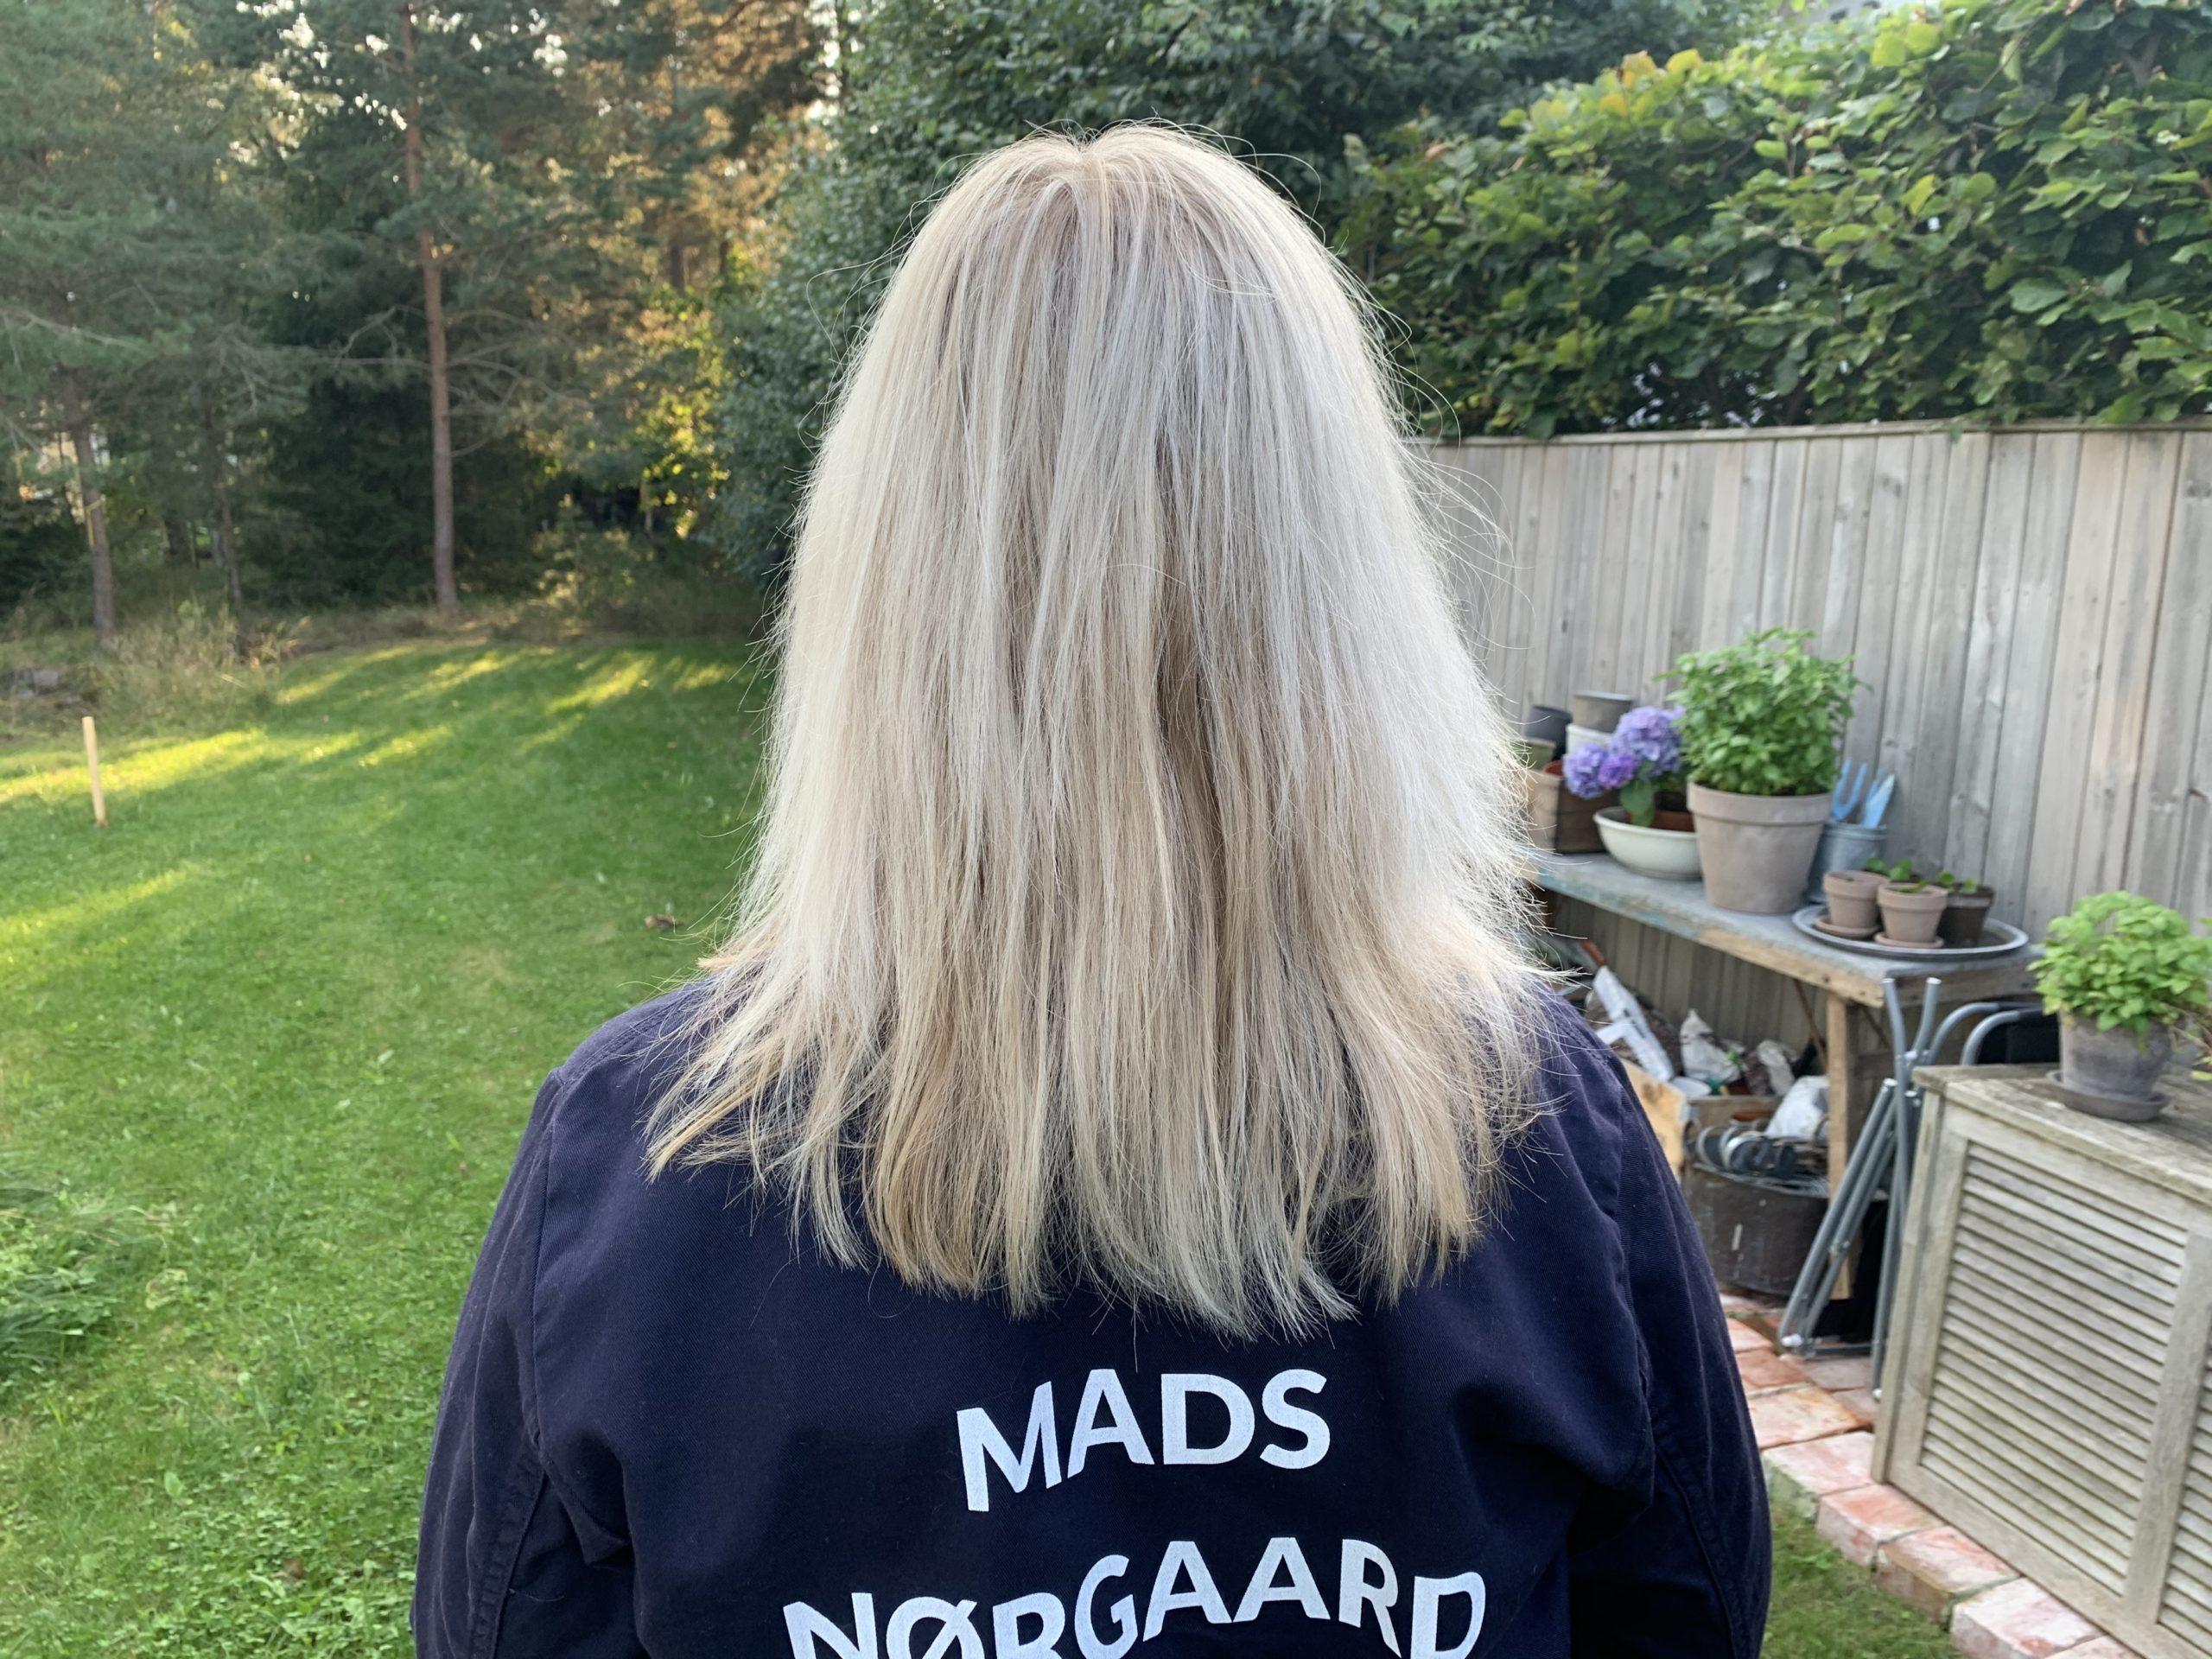 Askgrå hårfärg i min jobbverall från Mads Nørgaard